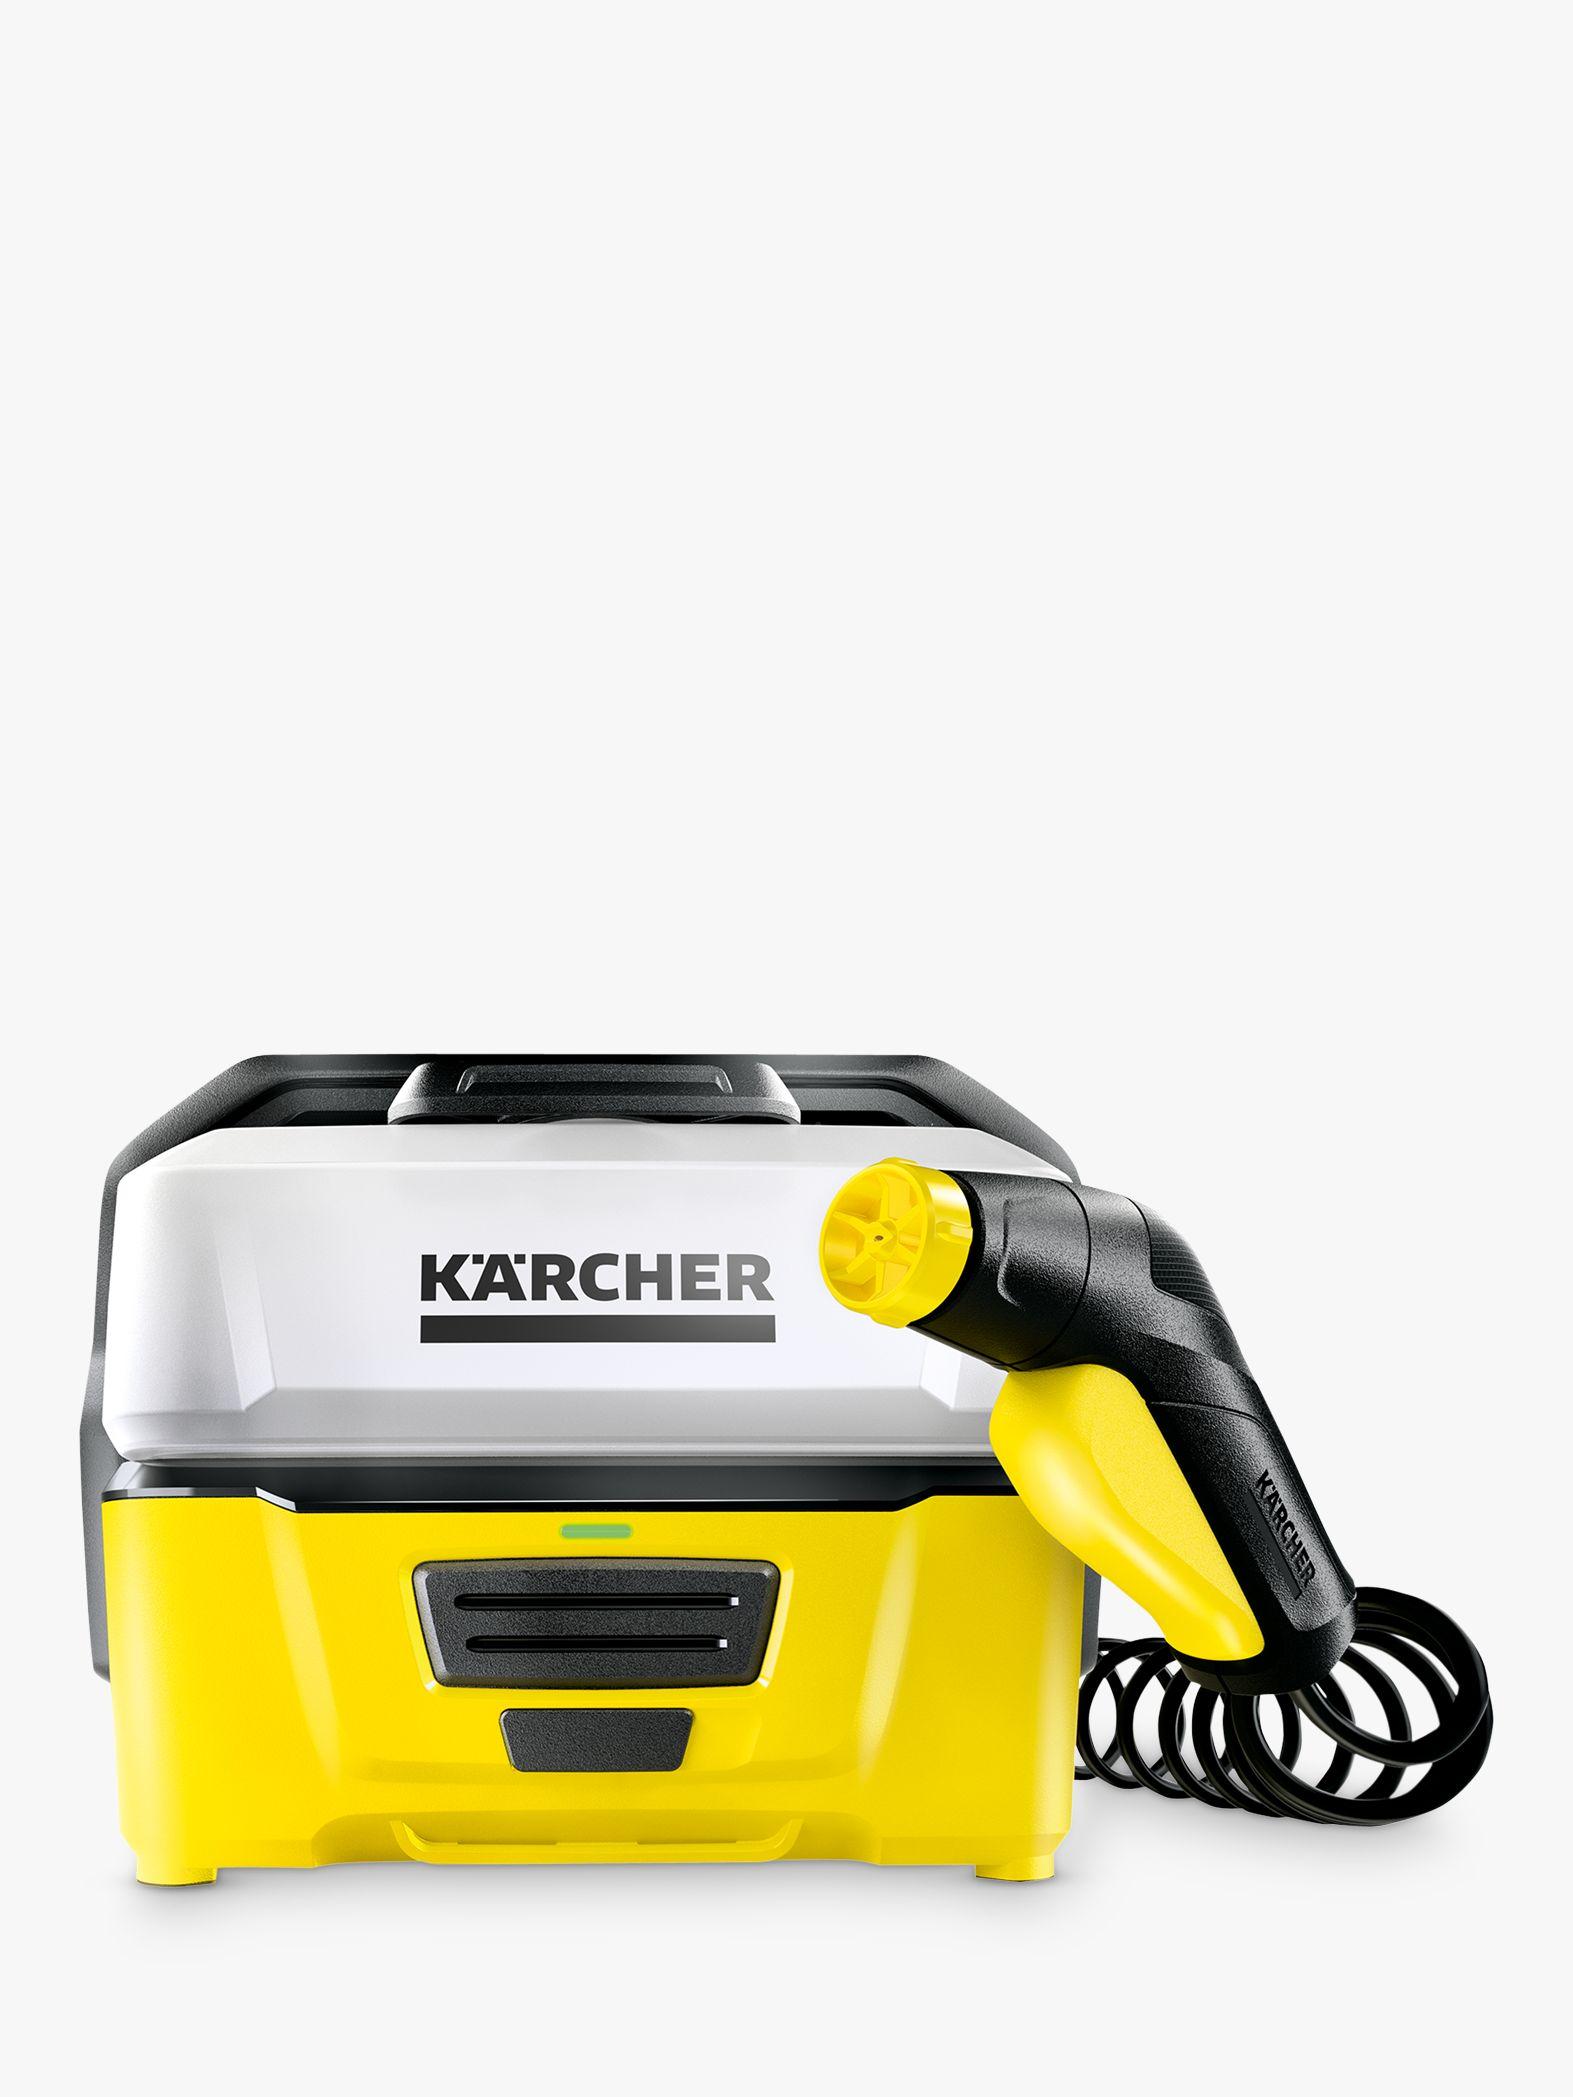 Karcher Kärcher OC3 Portable Cleaner